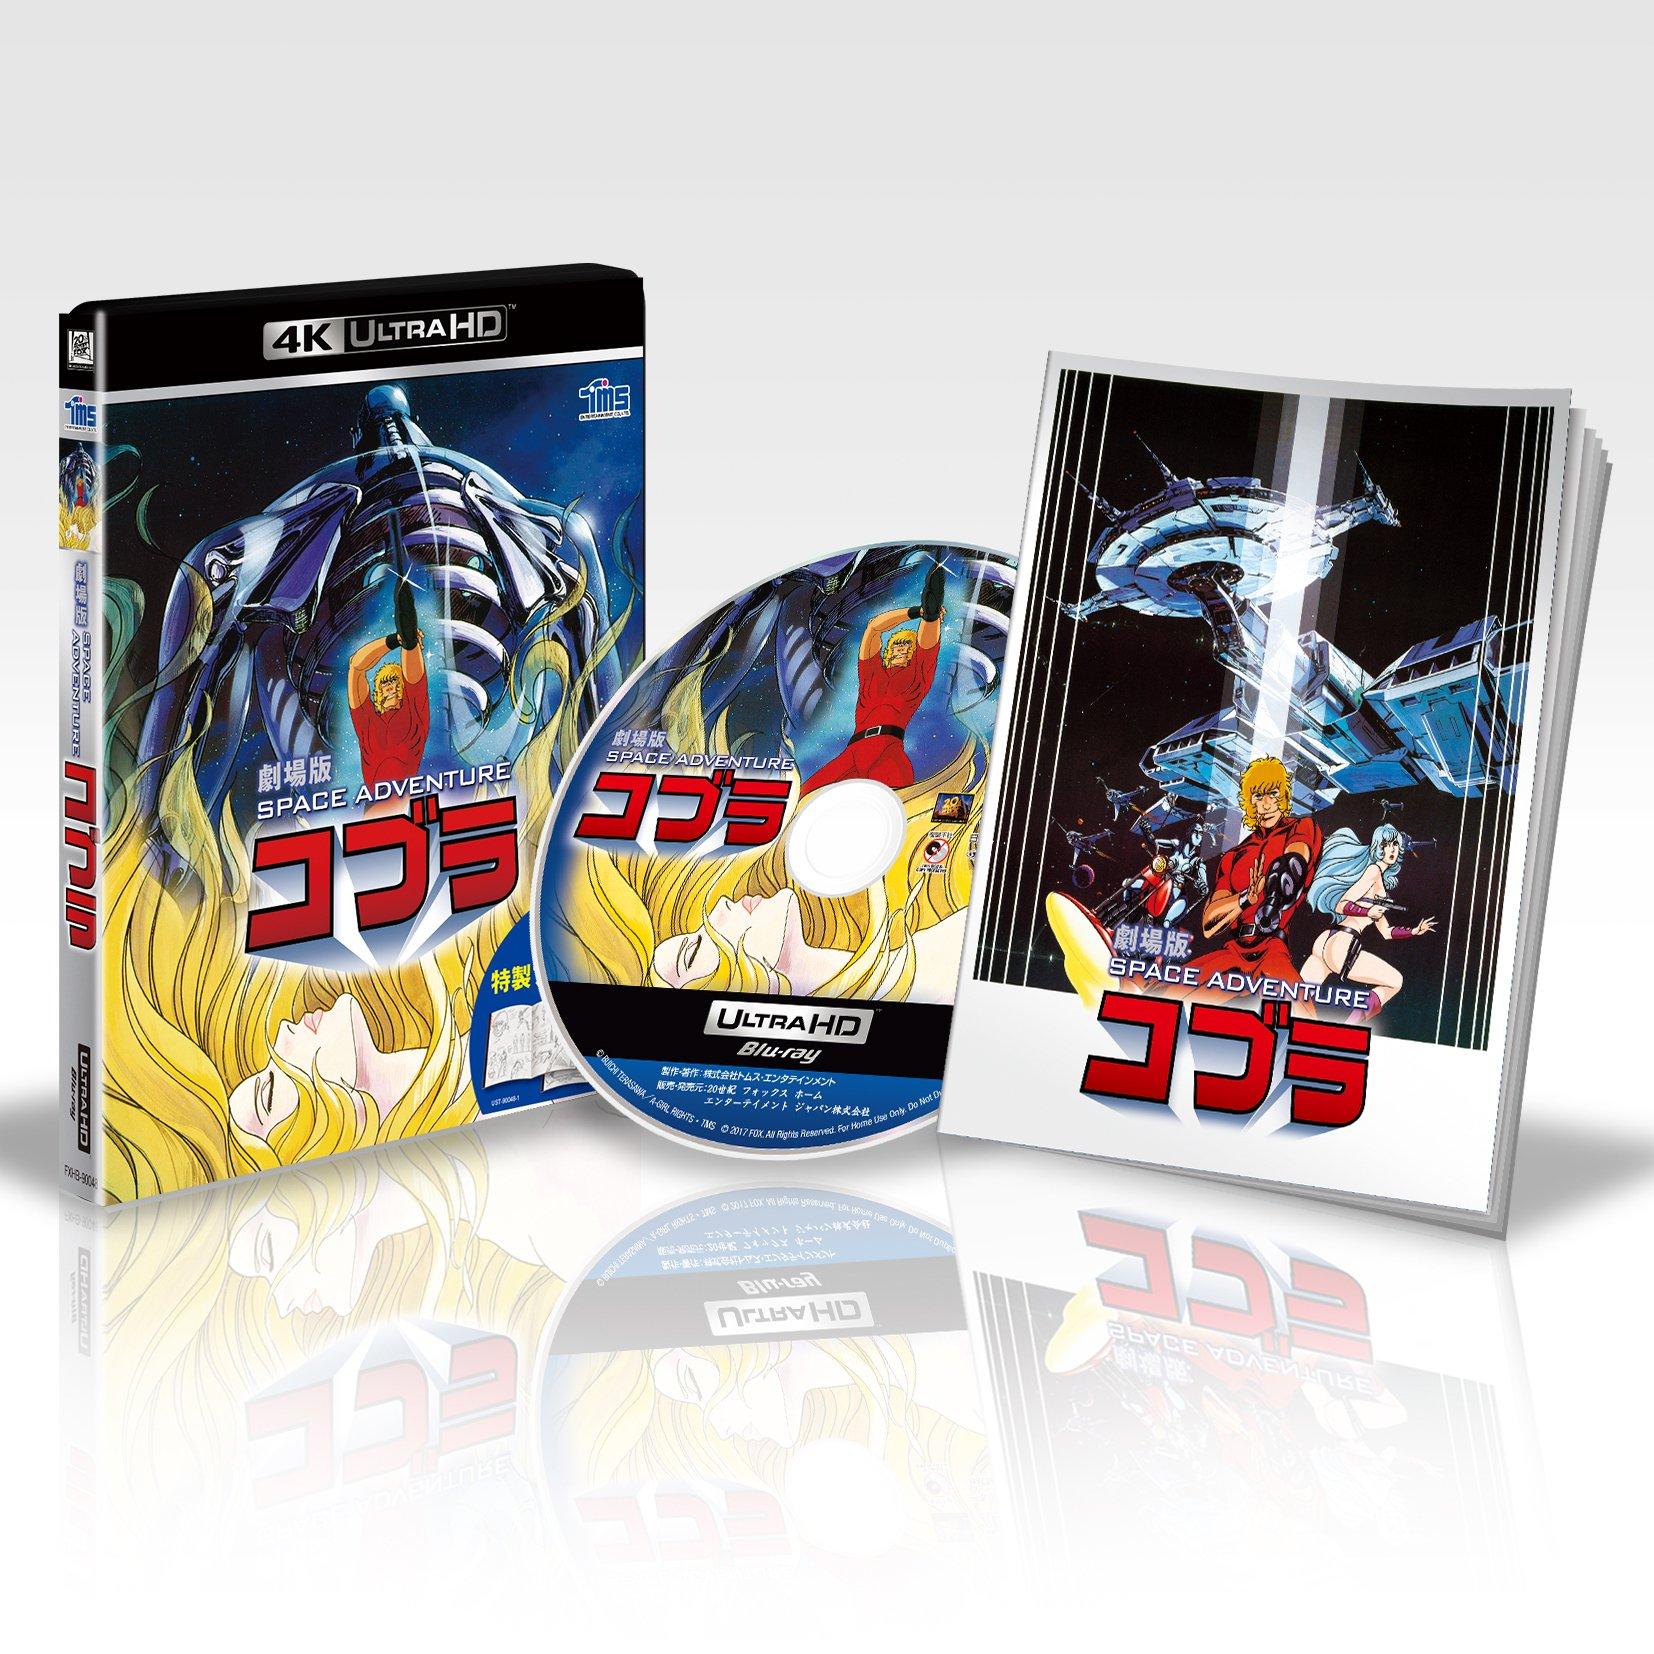 Cobra Manga 2010 Streaming: Space Adventure Cobra (movie)